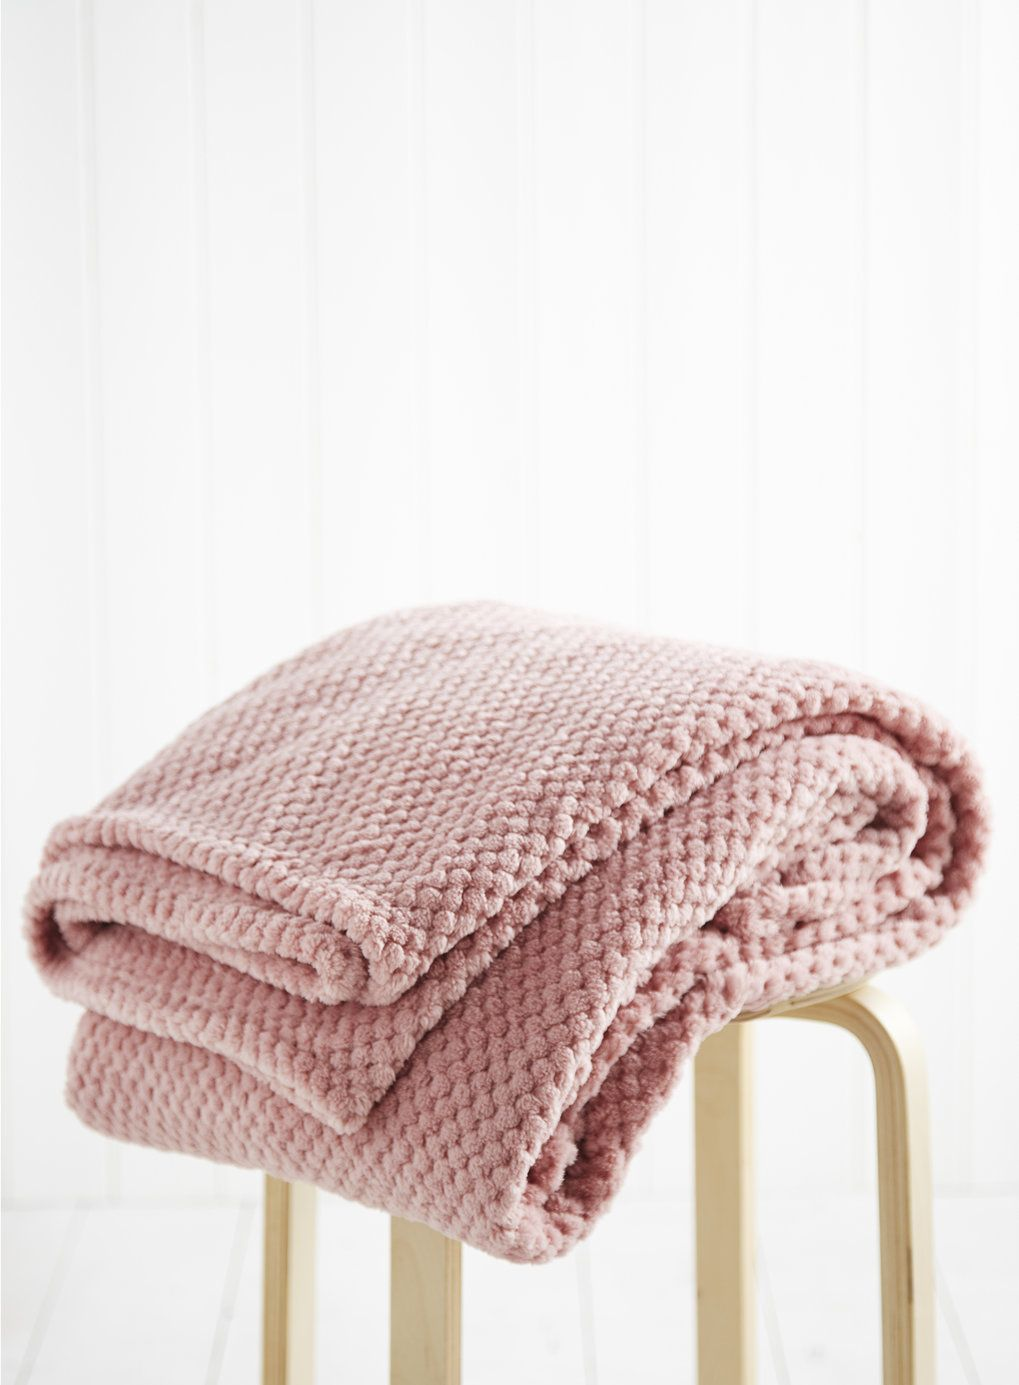 Blush Pink Throw Blanket Rose Pink Waffle Fleece Throw  Bhs  Home  Pinterest  Bhs Fleece